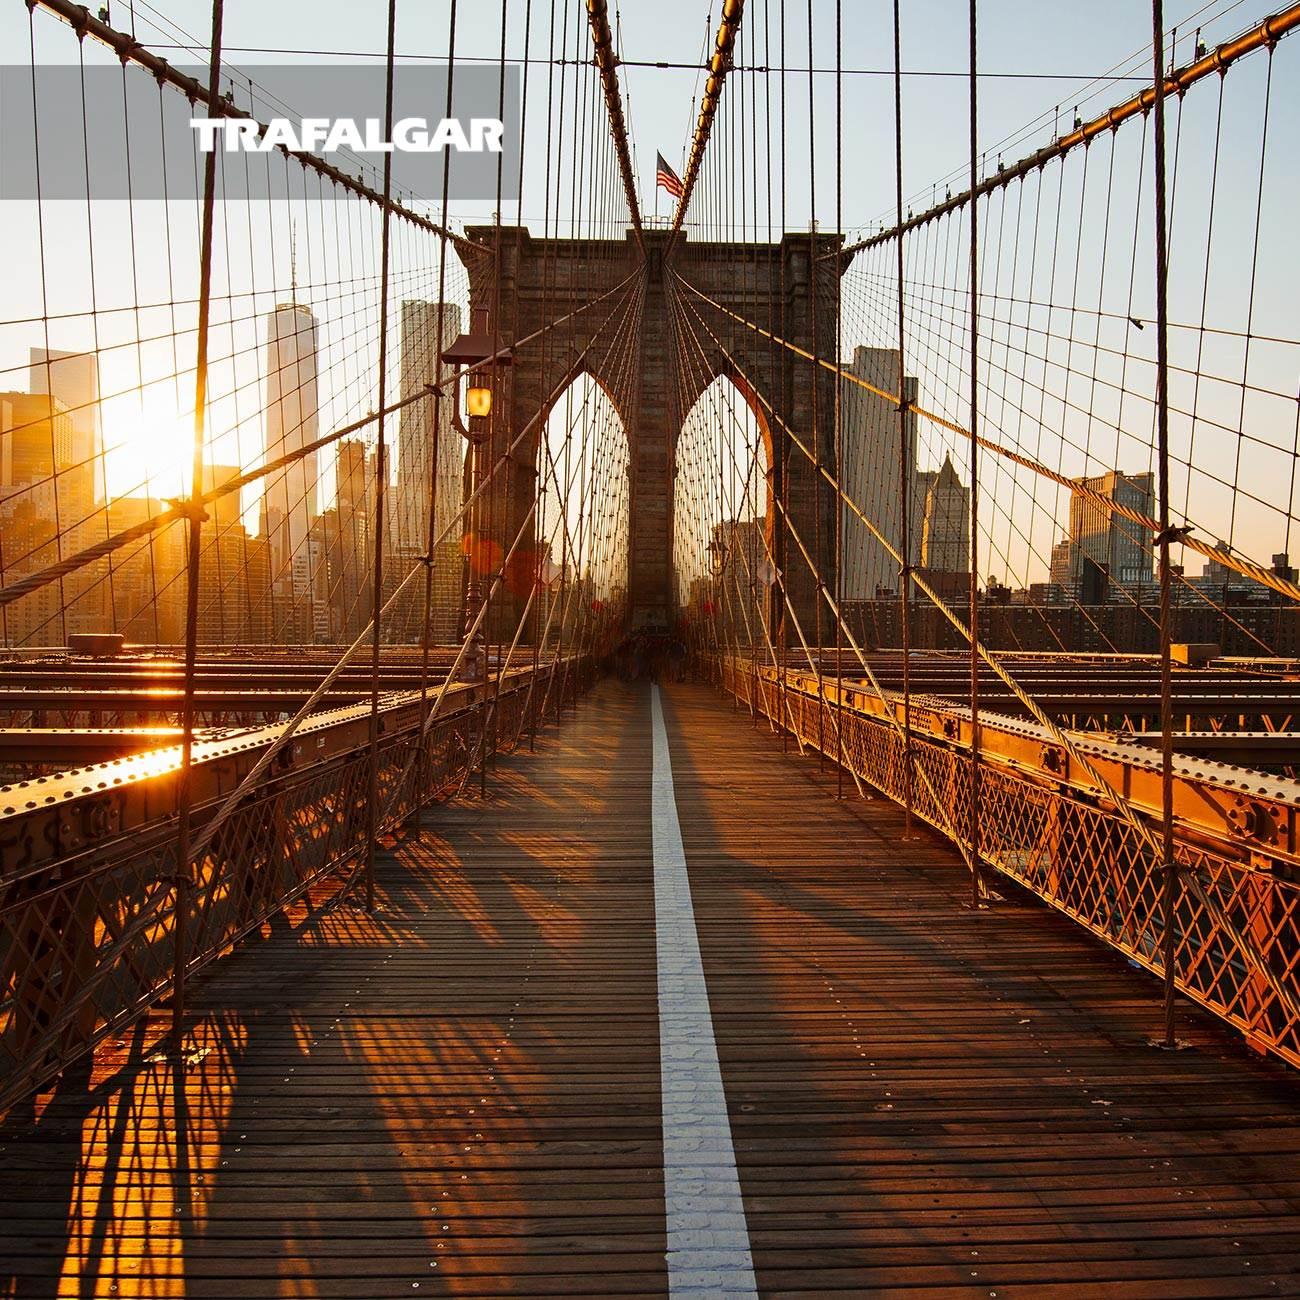 new york explorer 2022trafalgar tours with 3956 reviews